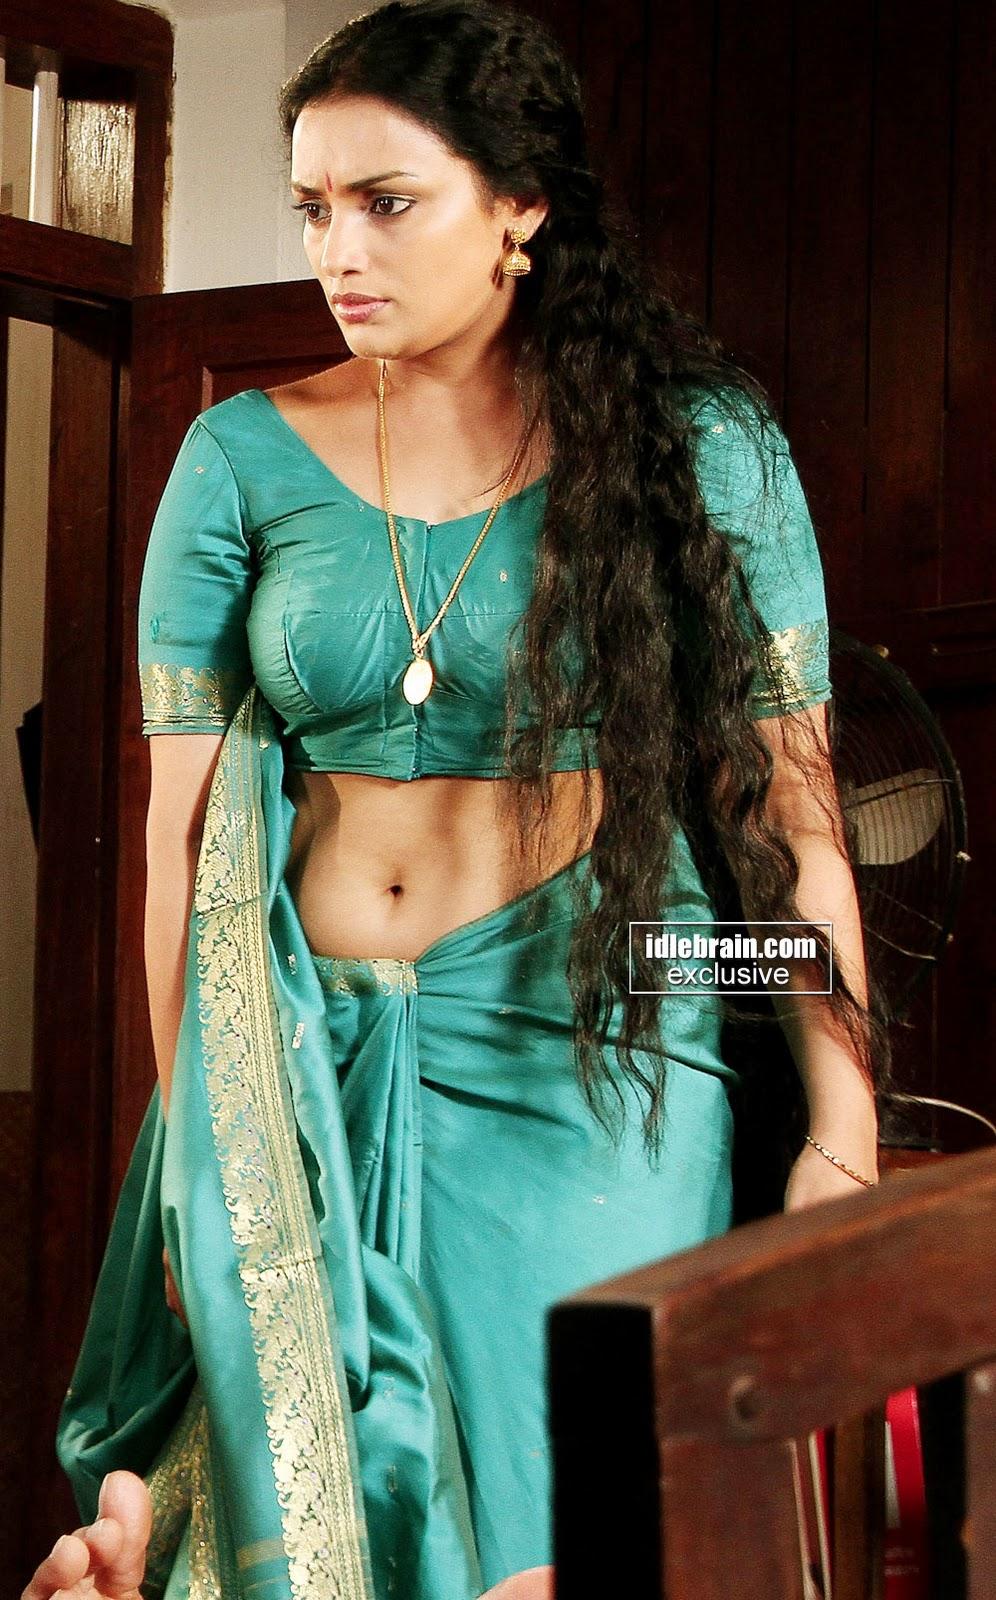 Lakshmi menon unseen boobs show in public - 2 1